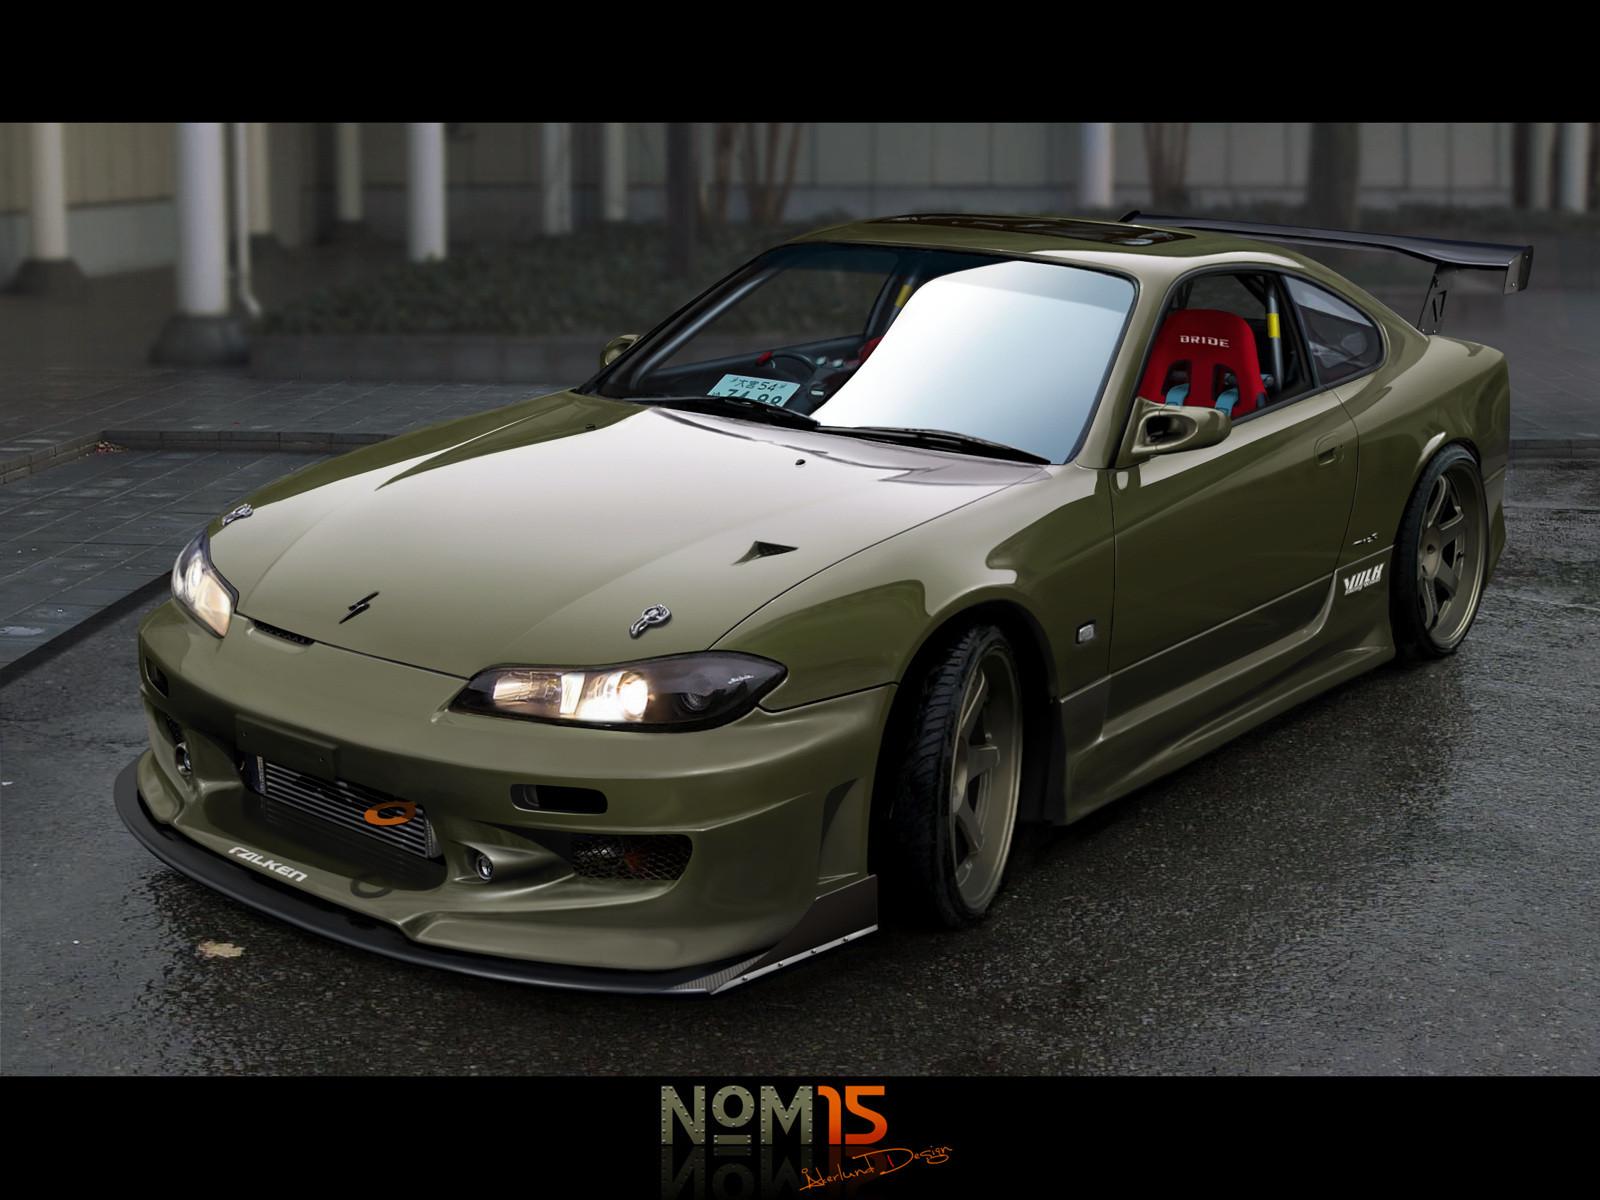 Nissan Silvia S15 by NOM15